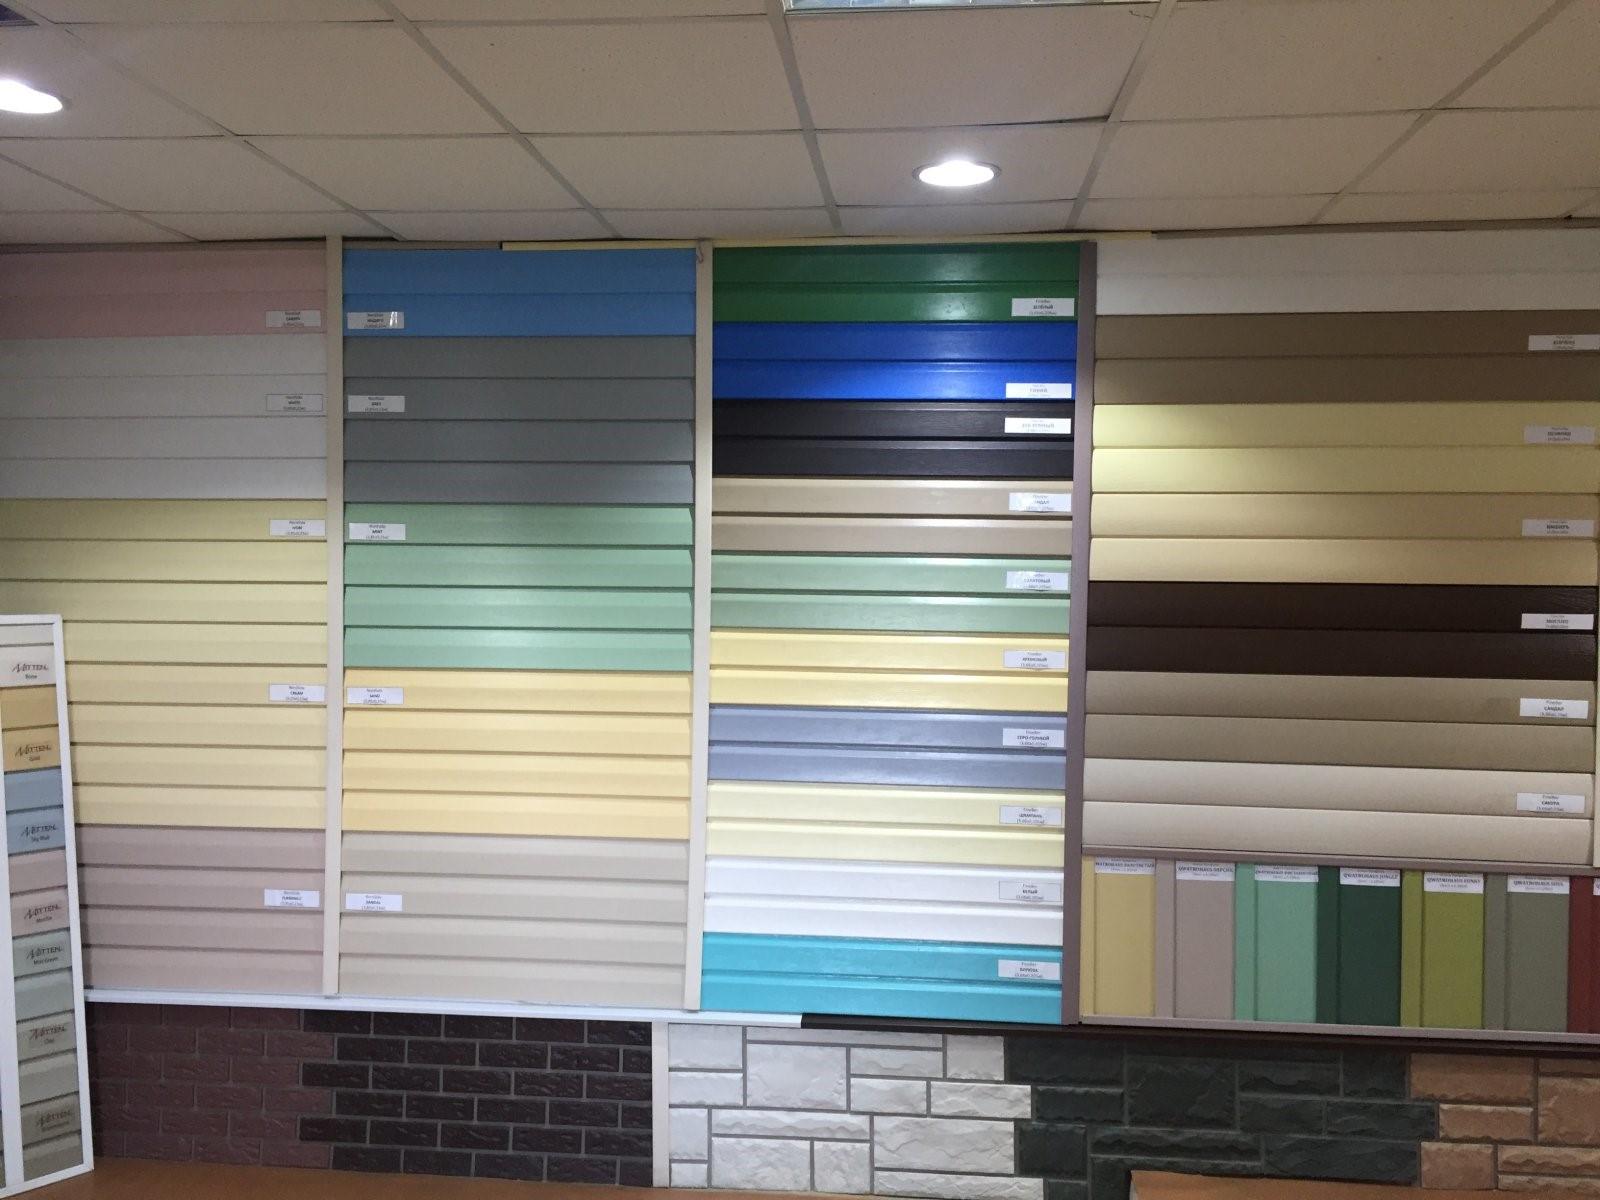 Разновидности сайдинга для обшивки стен зданий